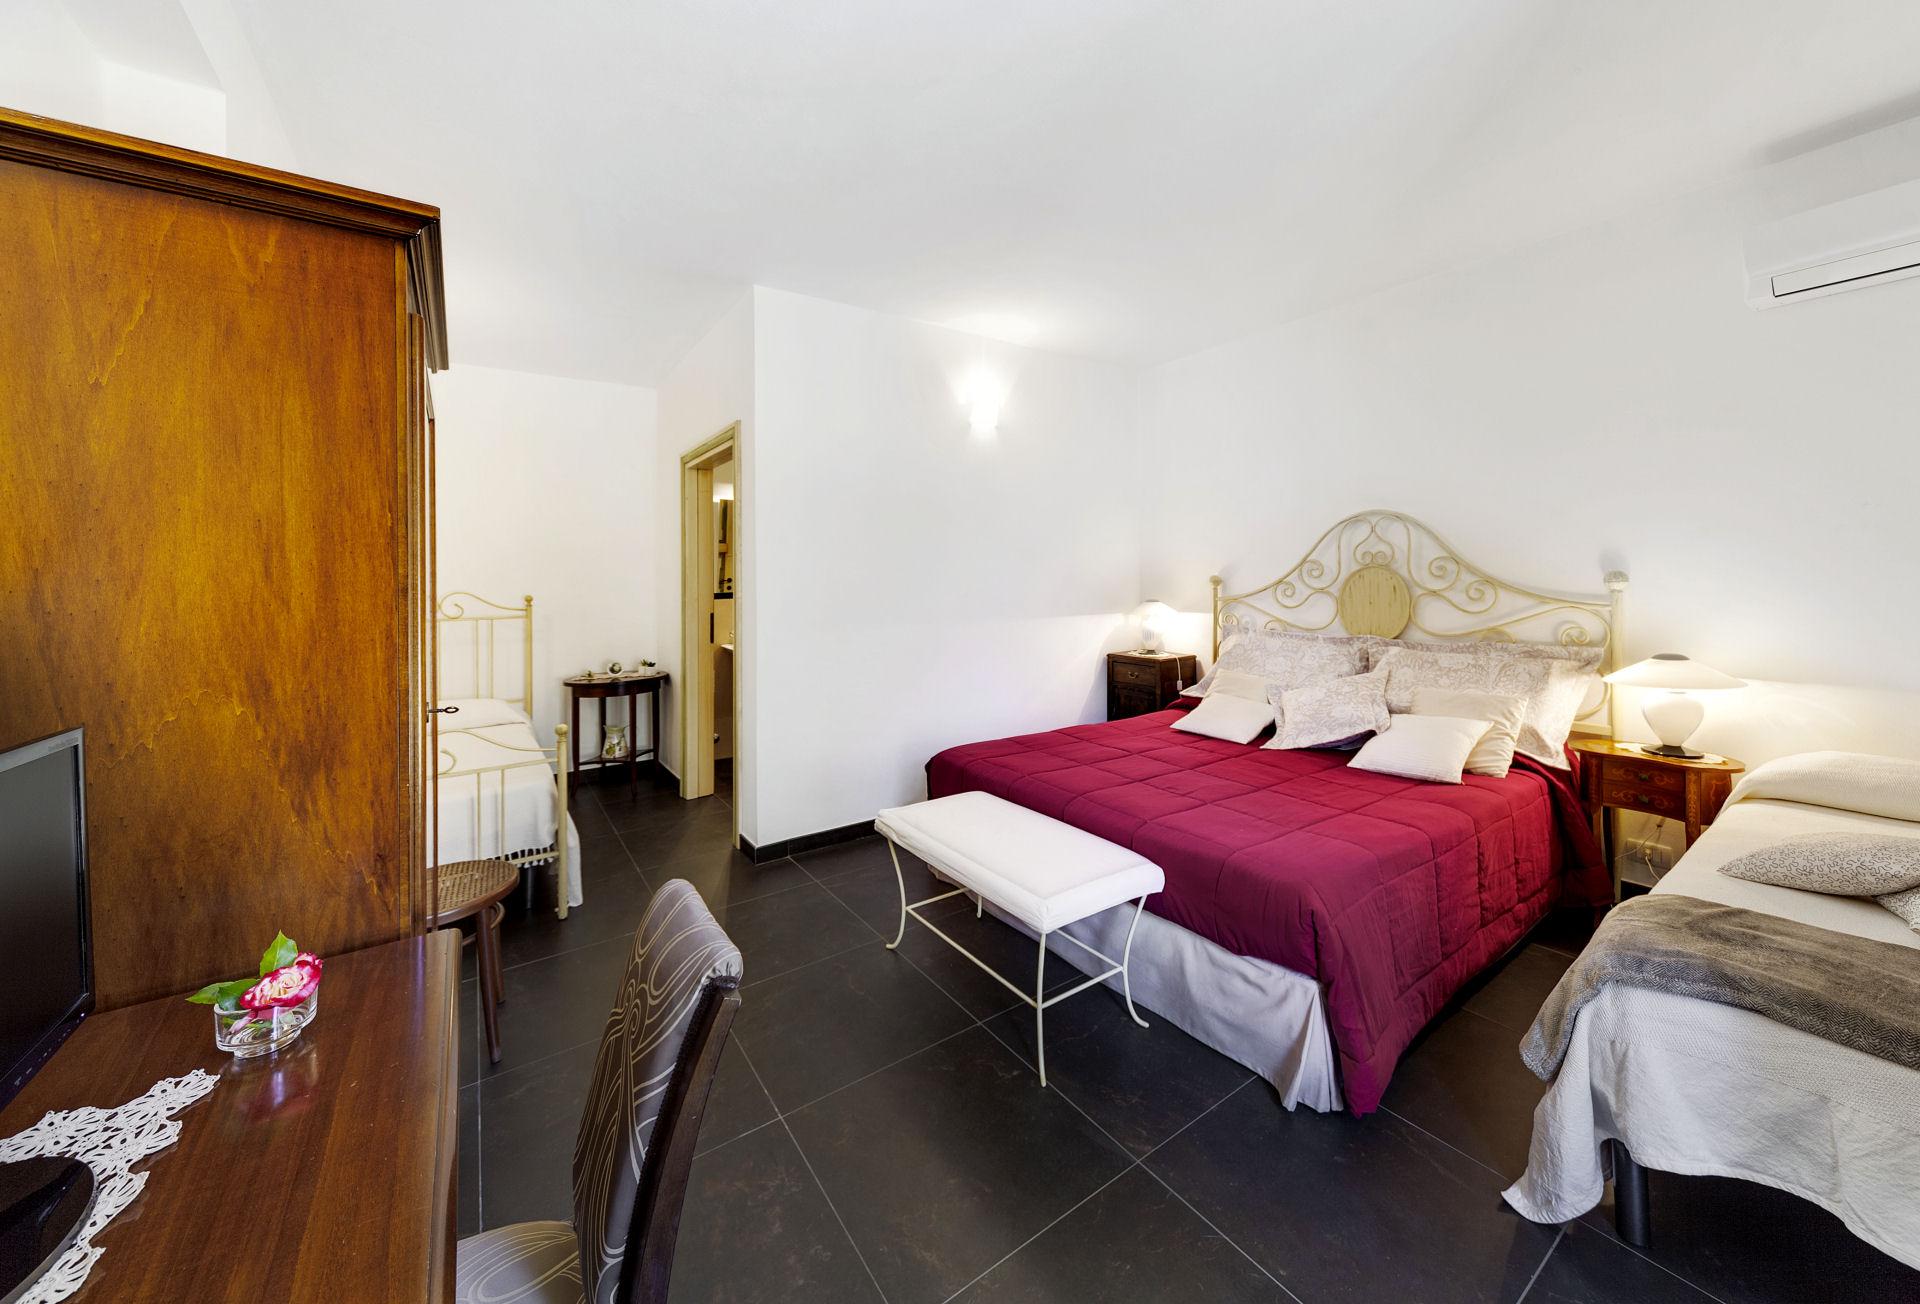 Camere Standard, CAMERA STANDARD SILVA SURI, Silva Suri, Country Hotel, Ragusa, Marina di Ragusa, Sala Ricevimenti. Hotel